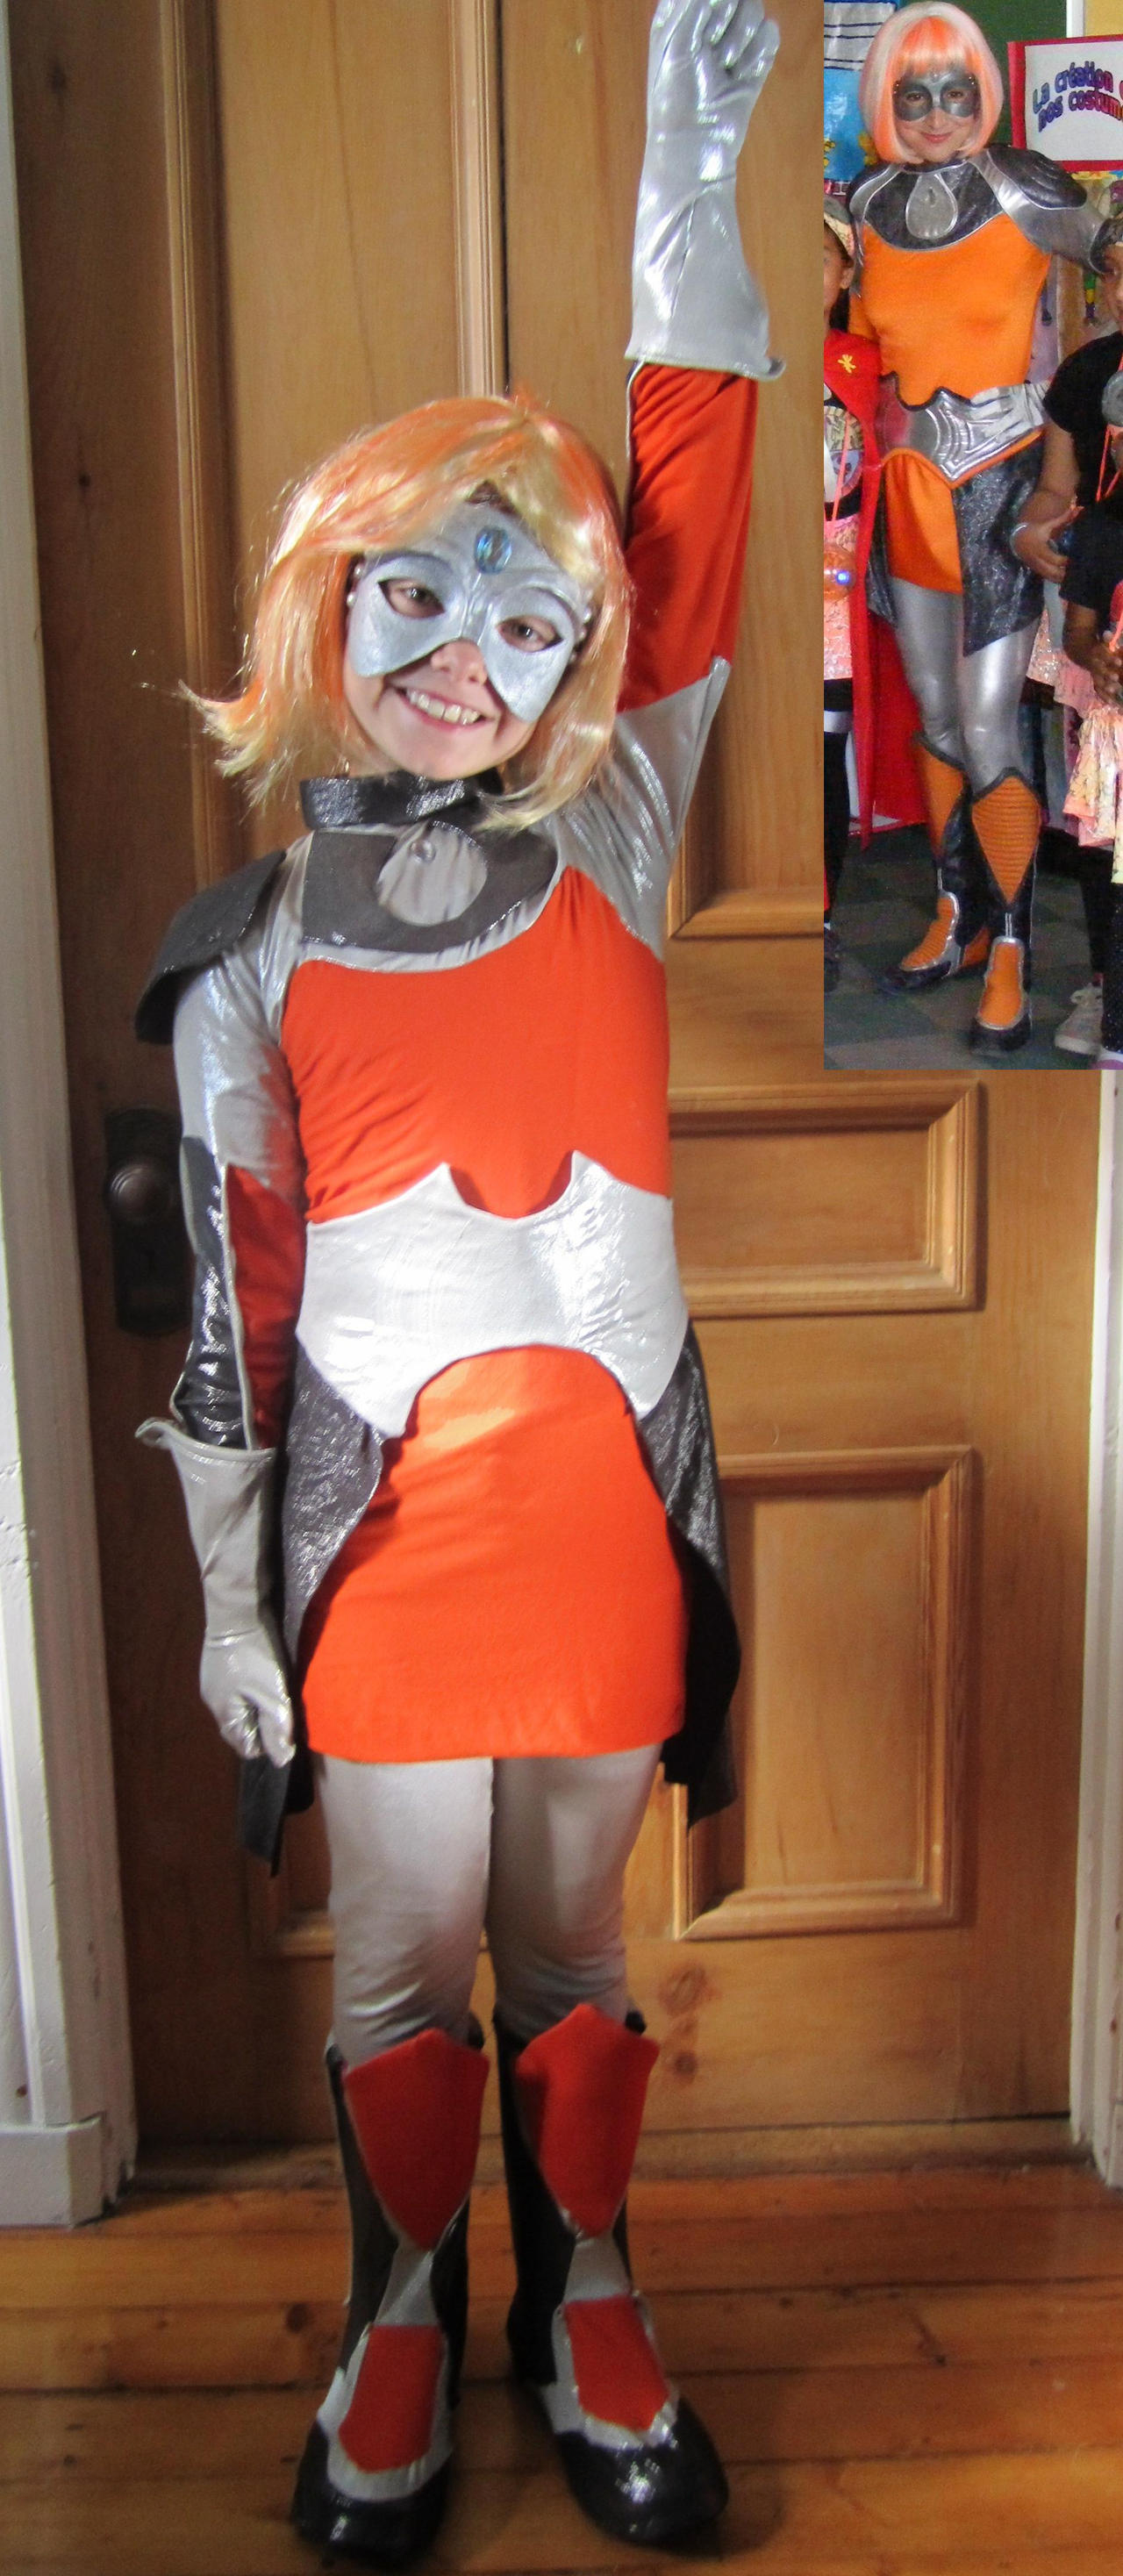 Titania From Kaboum Costume 2/2 by NiennaSurion